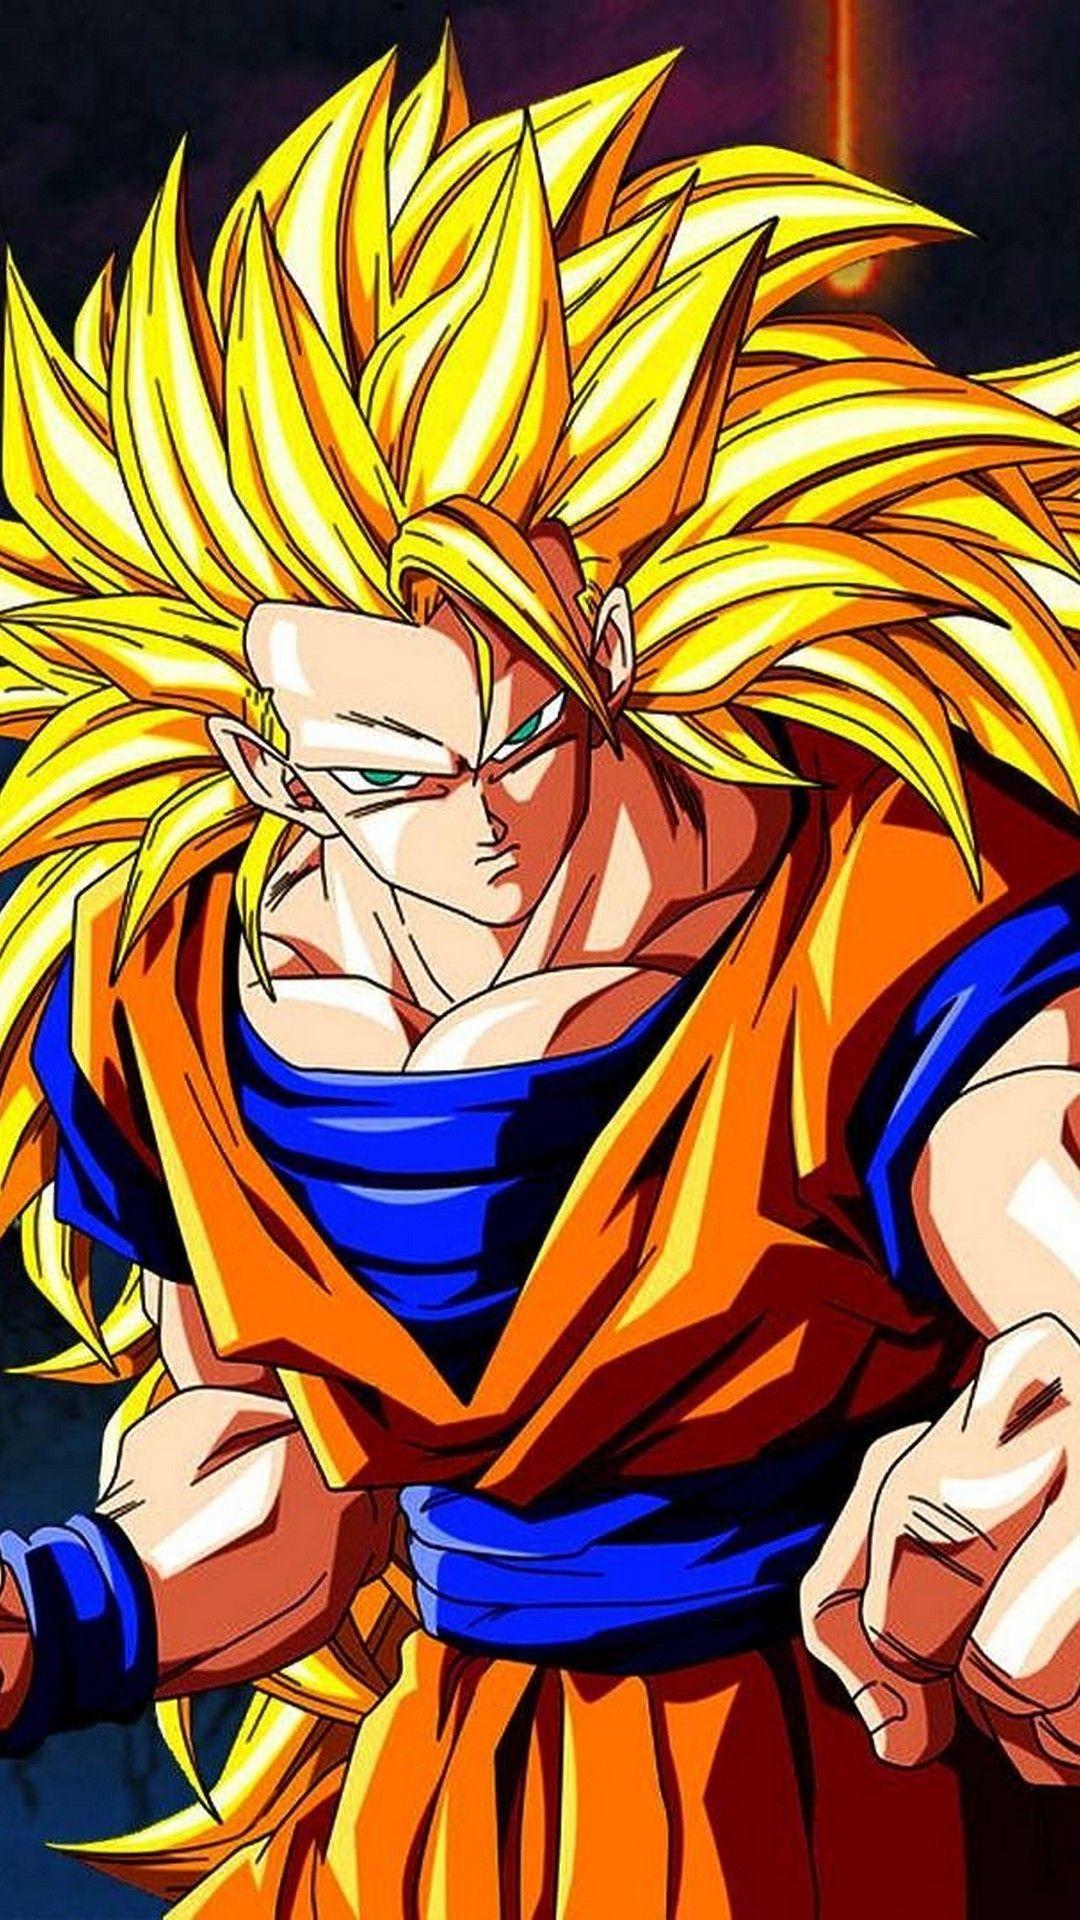 Android Wallpaper Goku Ssj3 Best Mobile Wallpaper Anime Dragon Ball Super Dragon Ball Dragon Ball Z